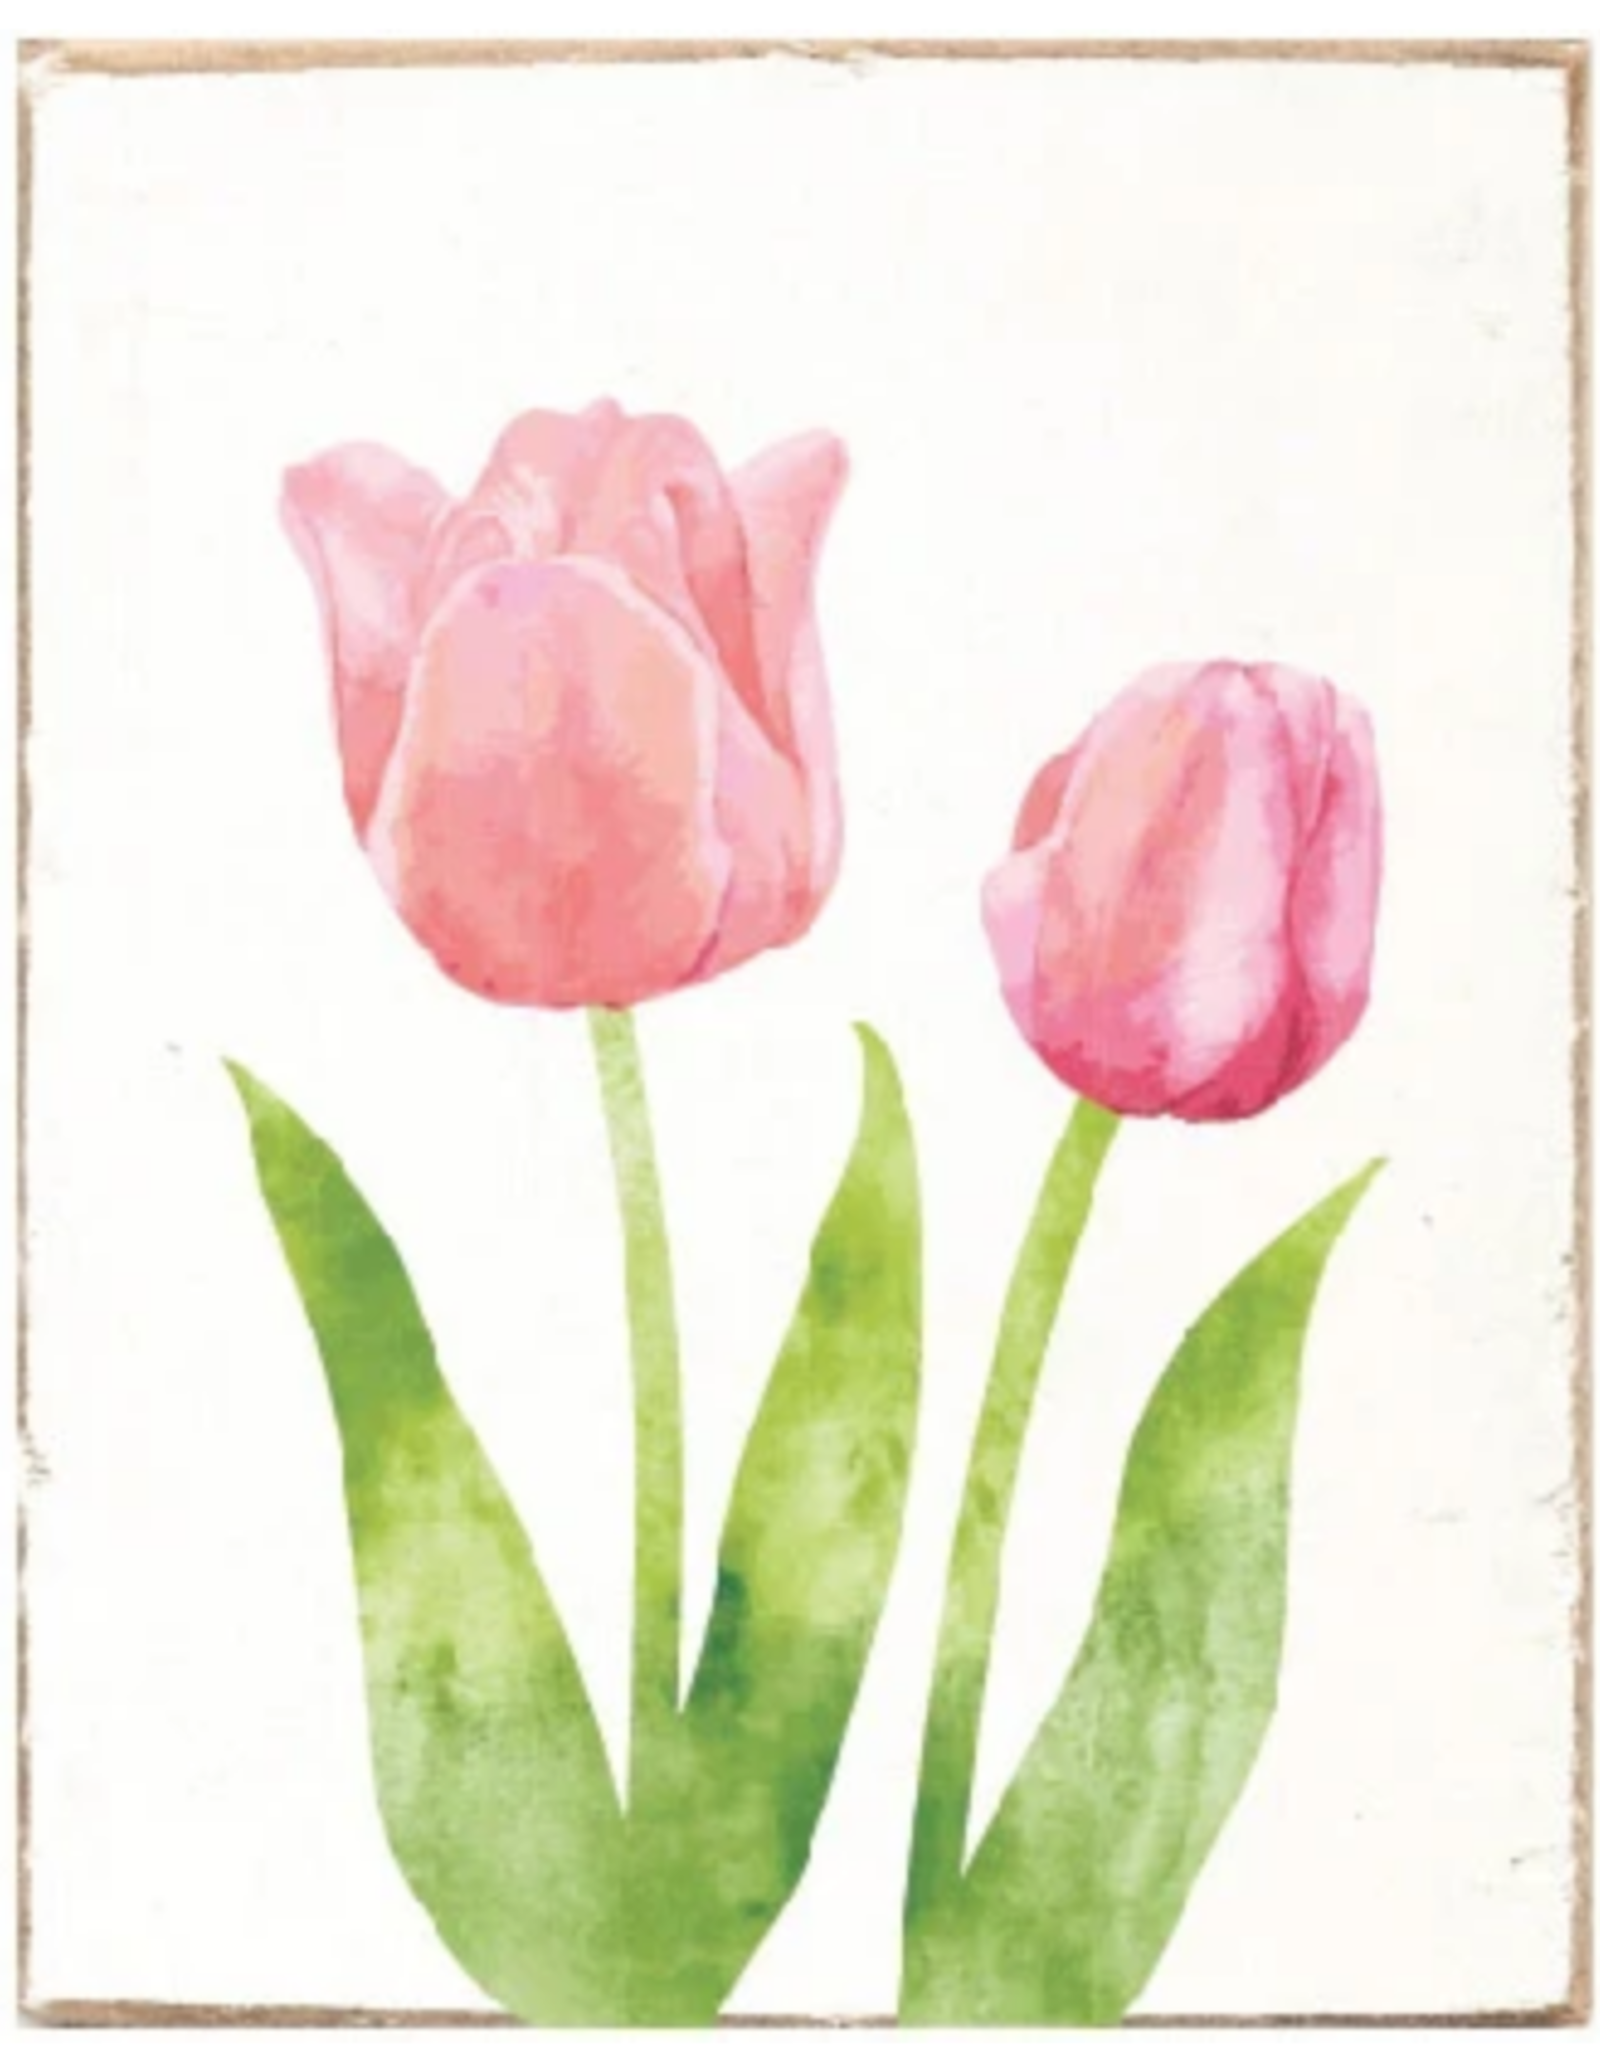 Rustic Marlin Rustic Marlin - Symbol Blocks Tulips